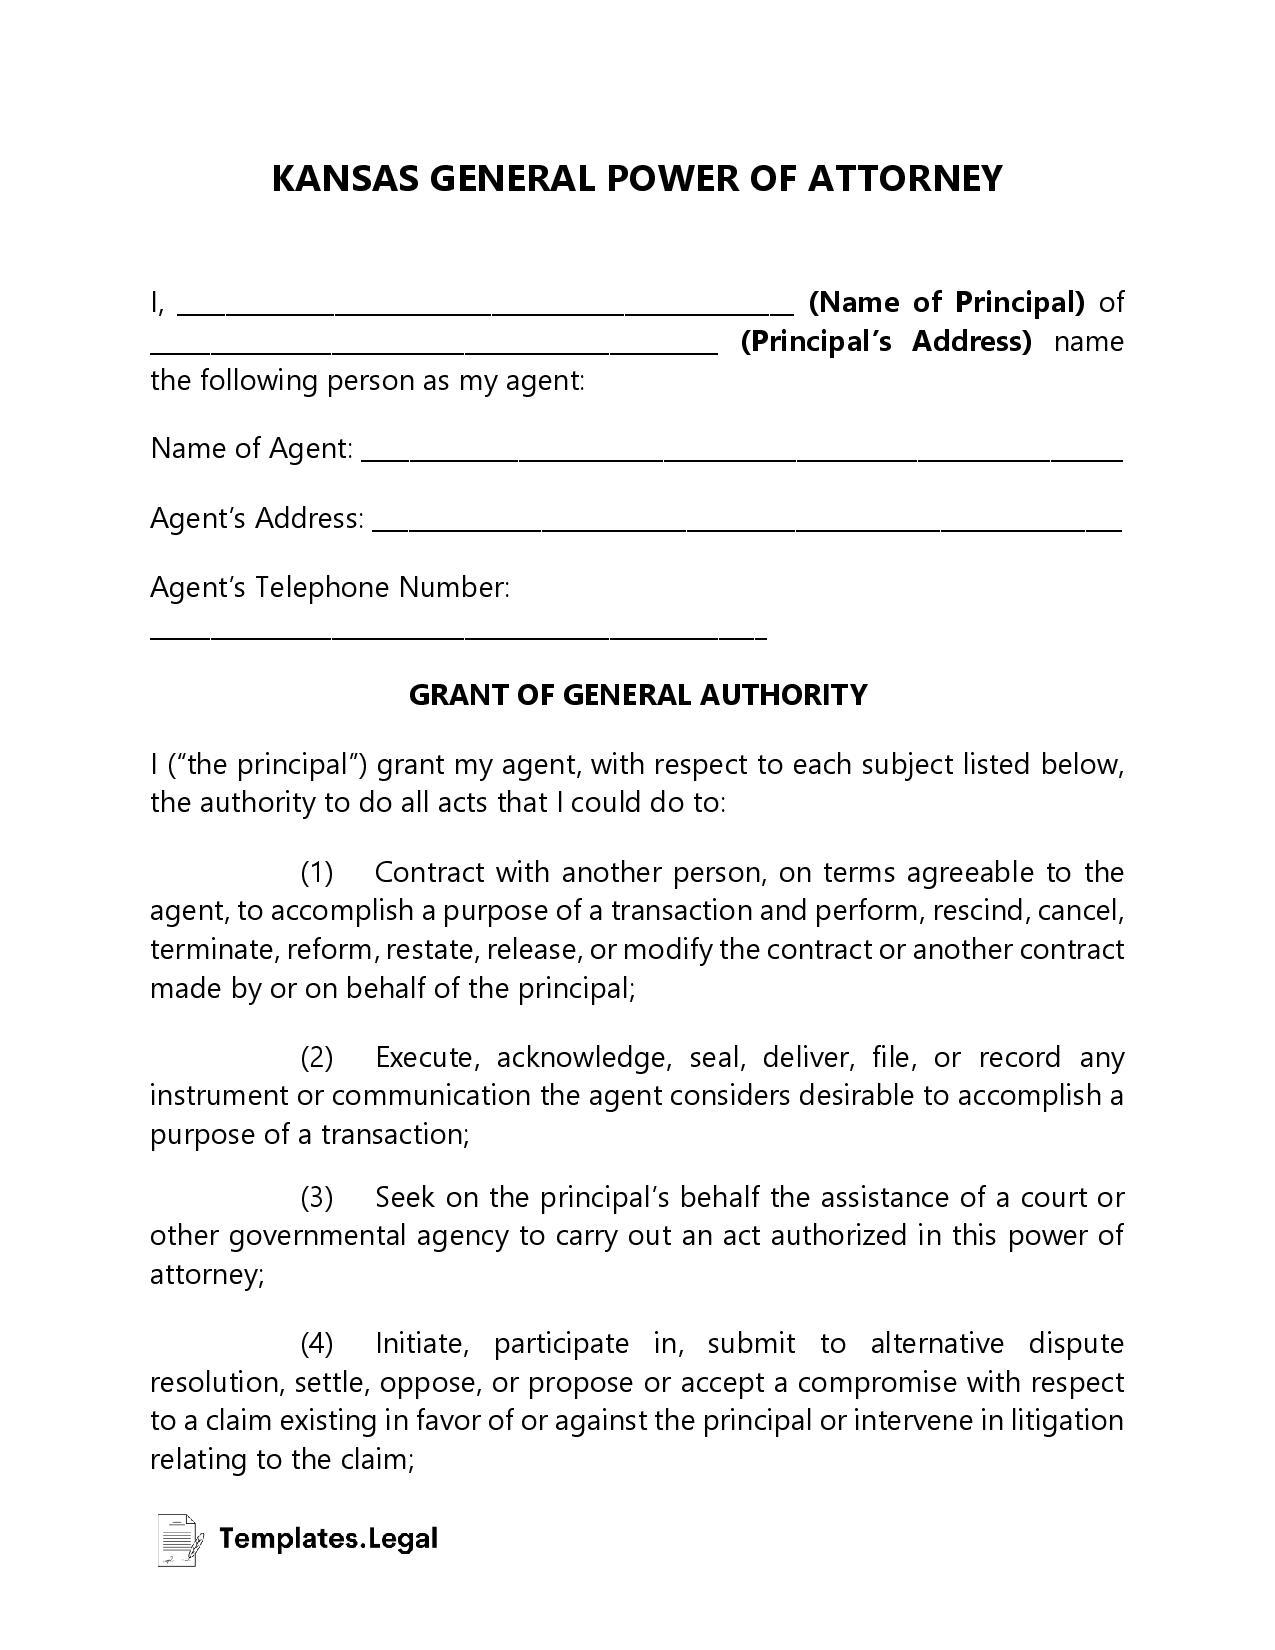 Kansas General Power of Attorney - Templates.Legal